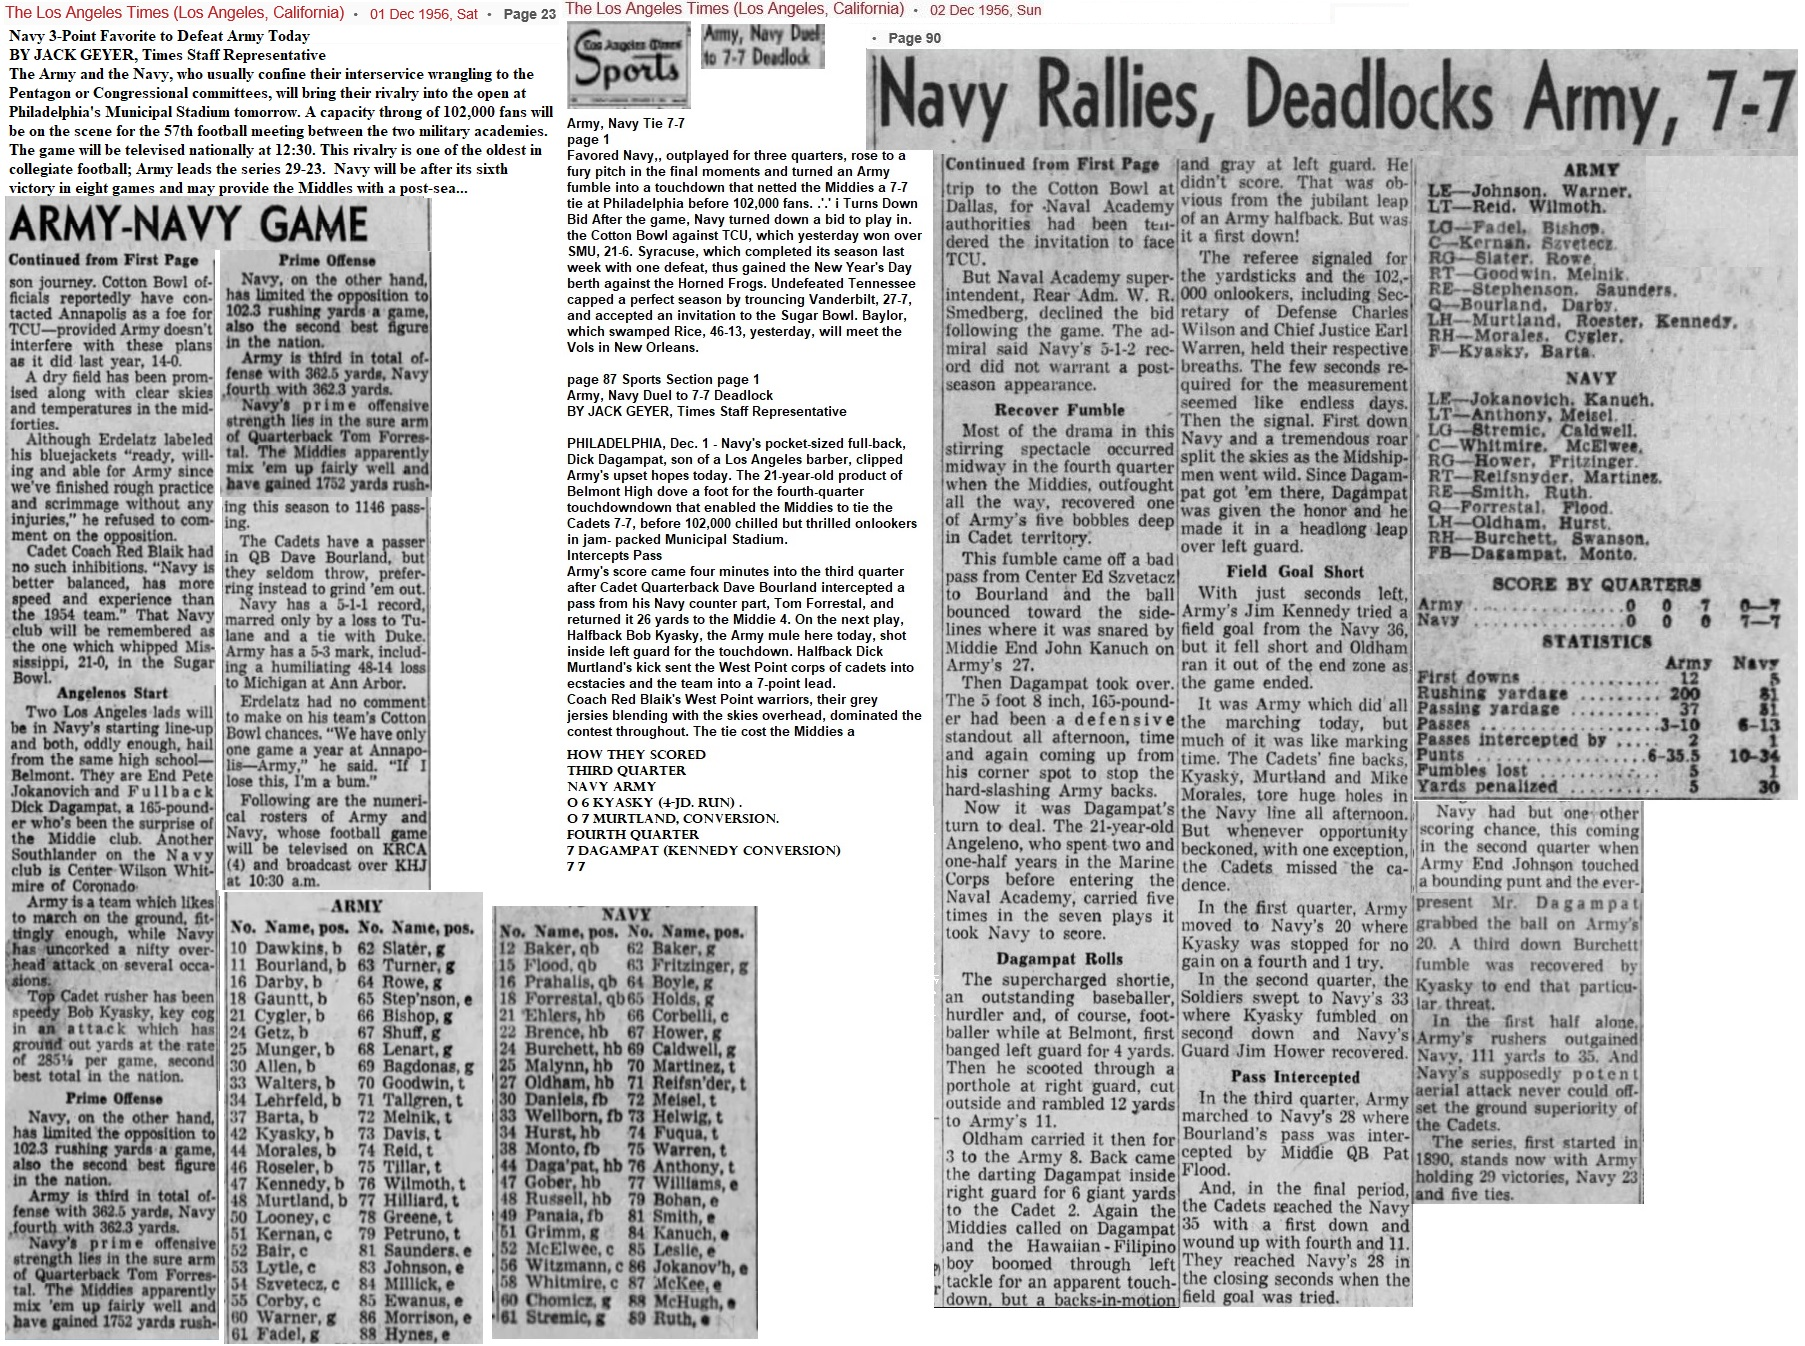 ArmyFB_1956_vsNavy_LosAngelesTimes_Dec1-21956